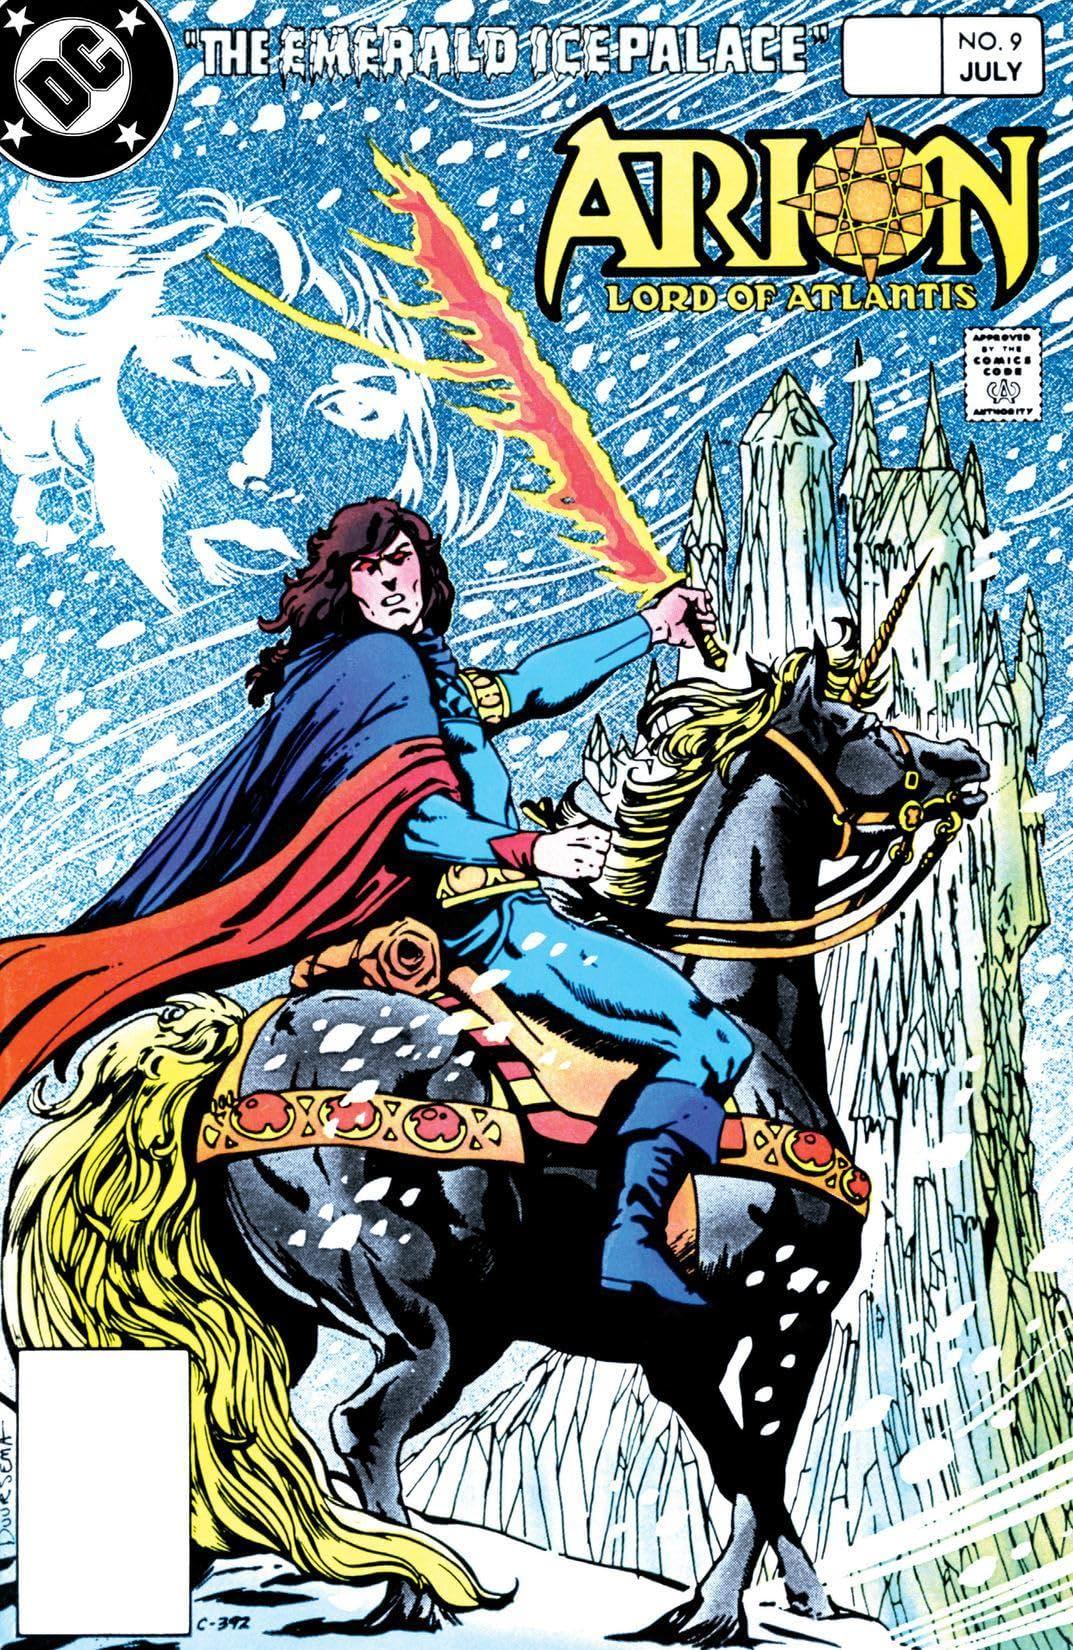 Arion, Lord of Atlantis (1982-1985) #9